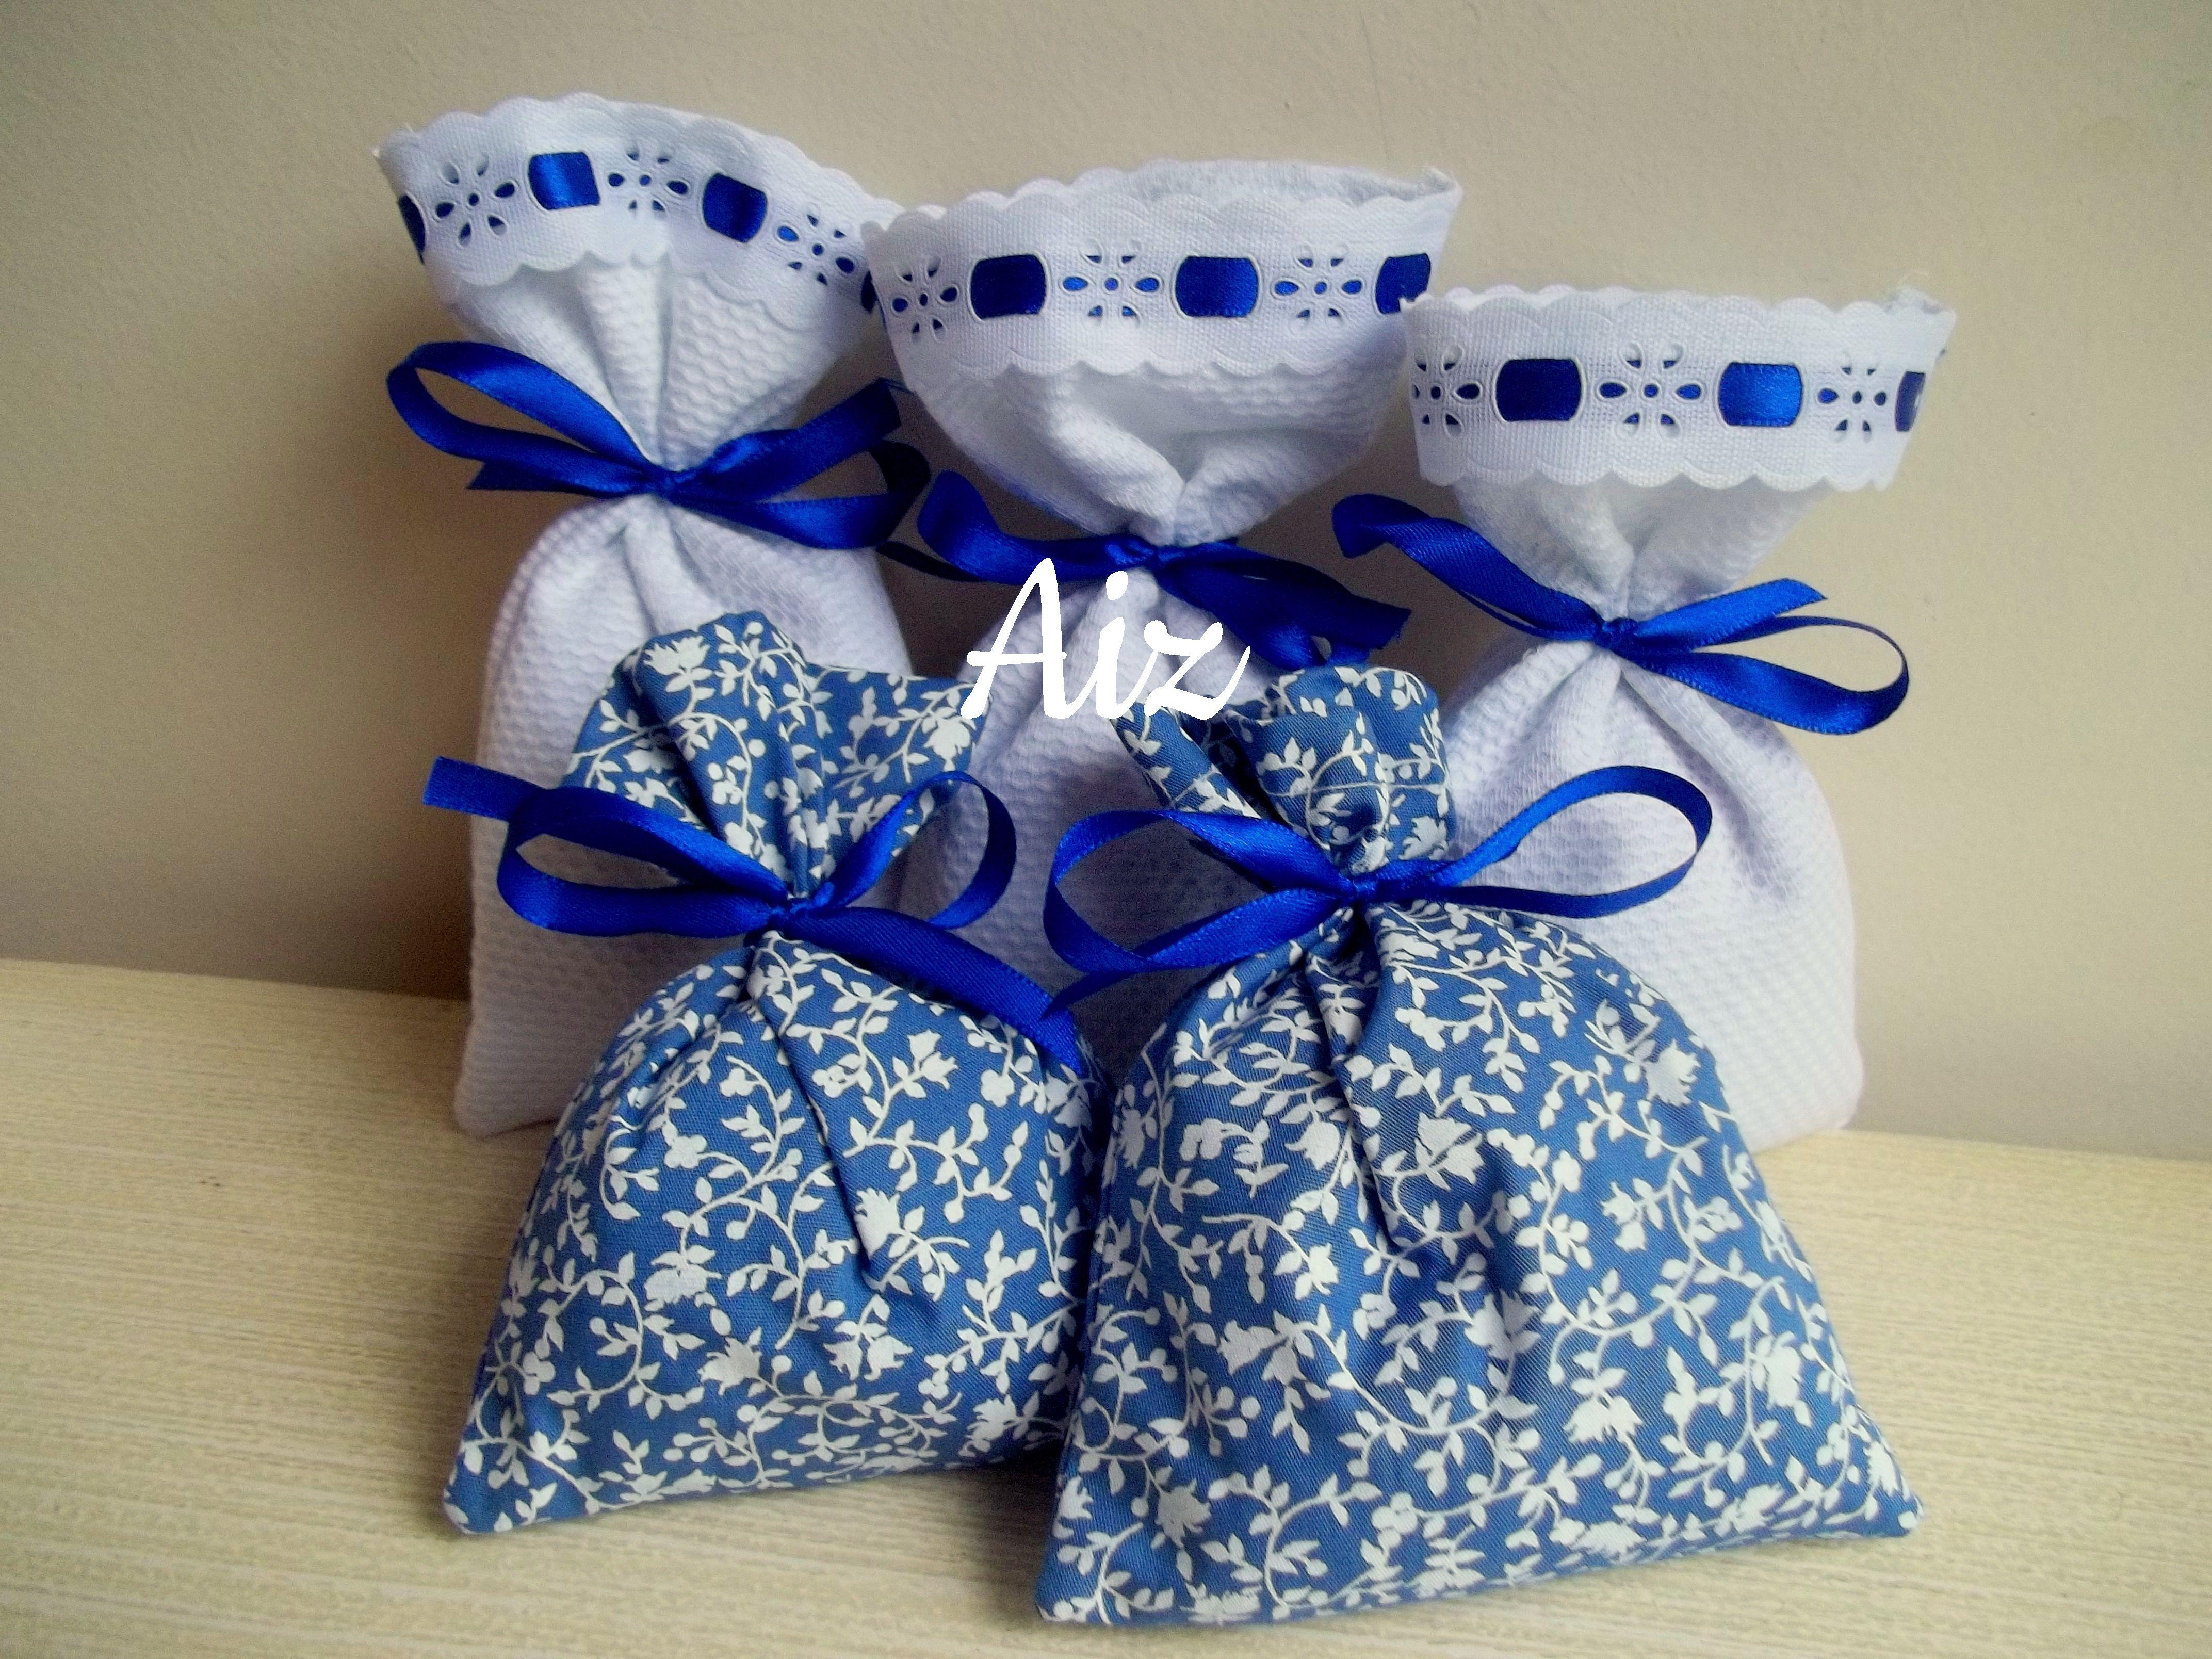 Sachês perfumados com fragrância de orquídea e framboesa. Estampados predominando a cor azul.